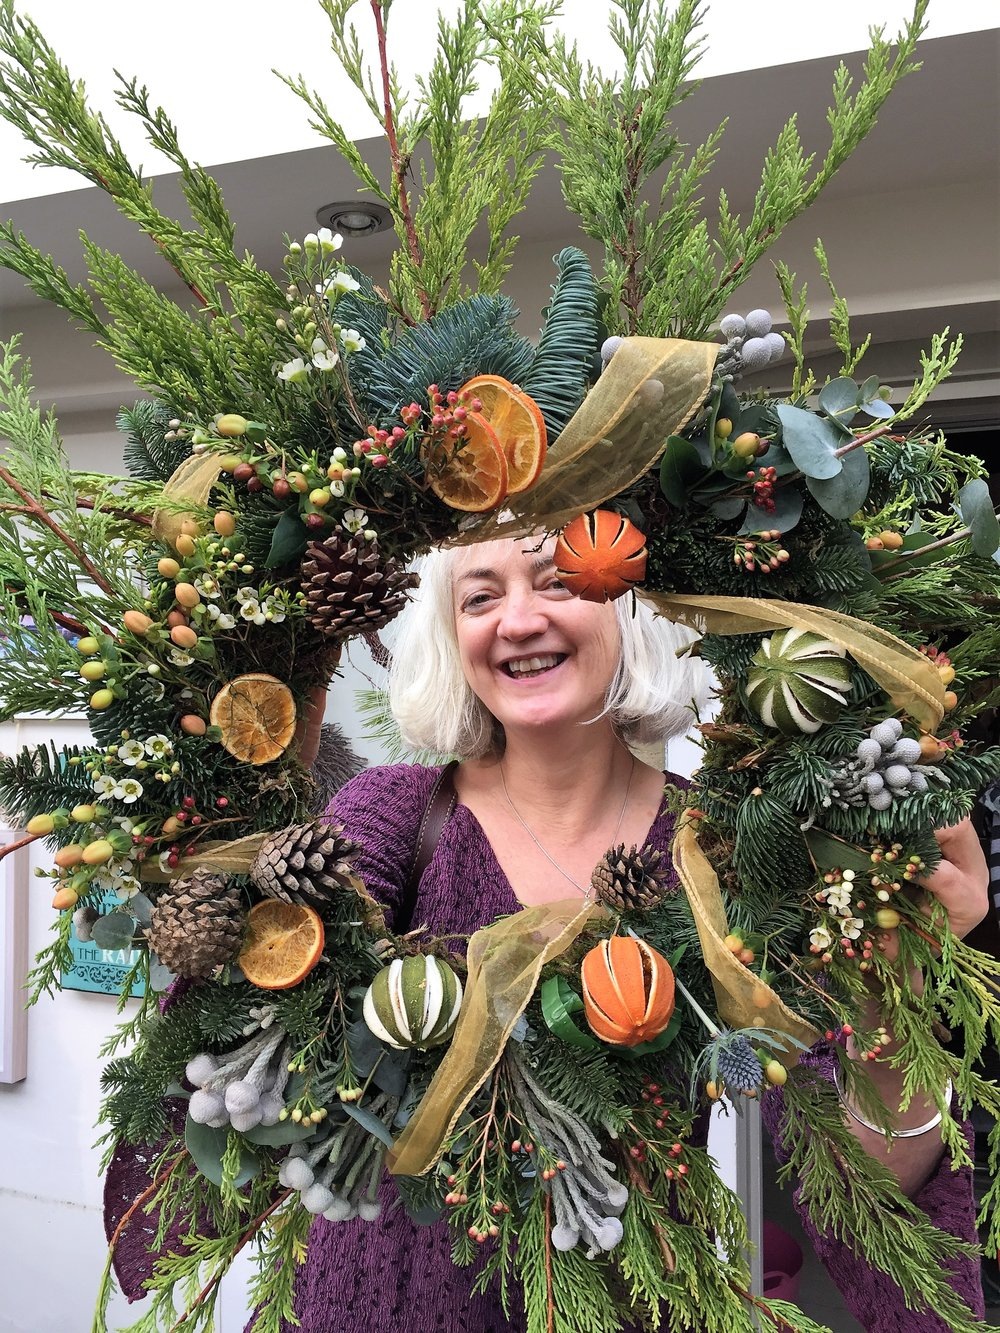 A fun, freestyle festive wreath